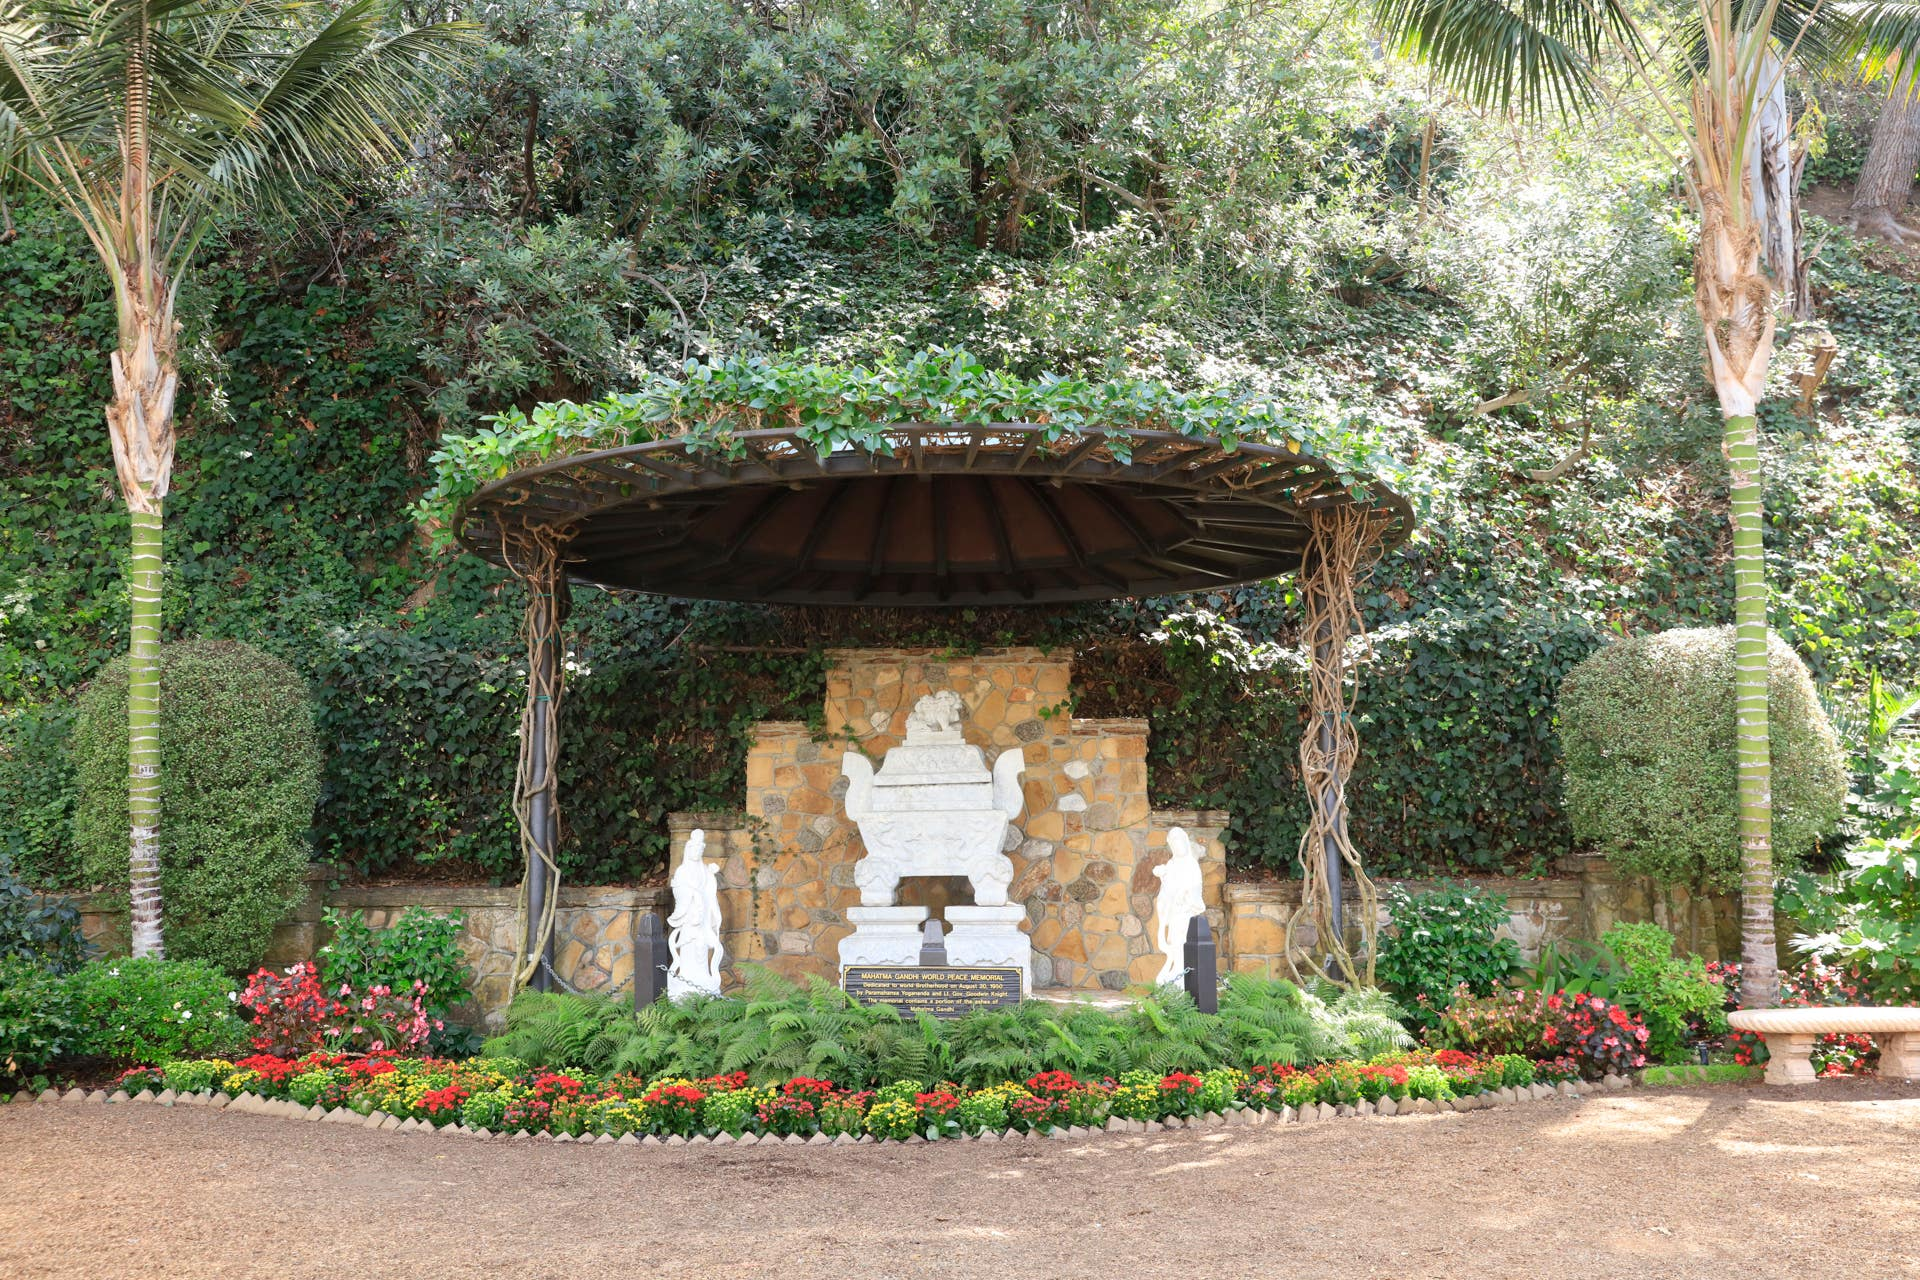 Gandhi's Ashes The Self Realization Lake Shrine 2019